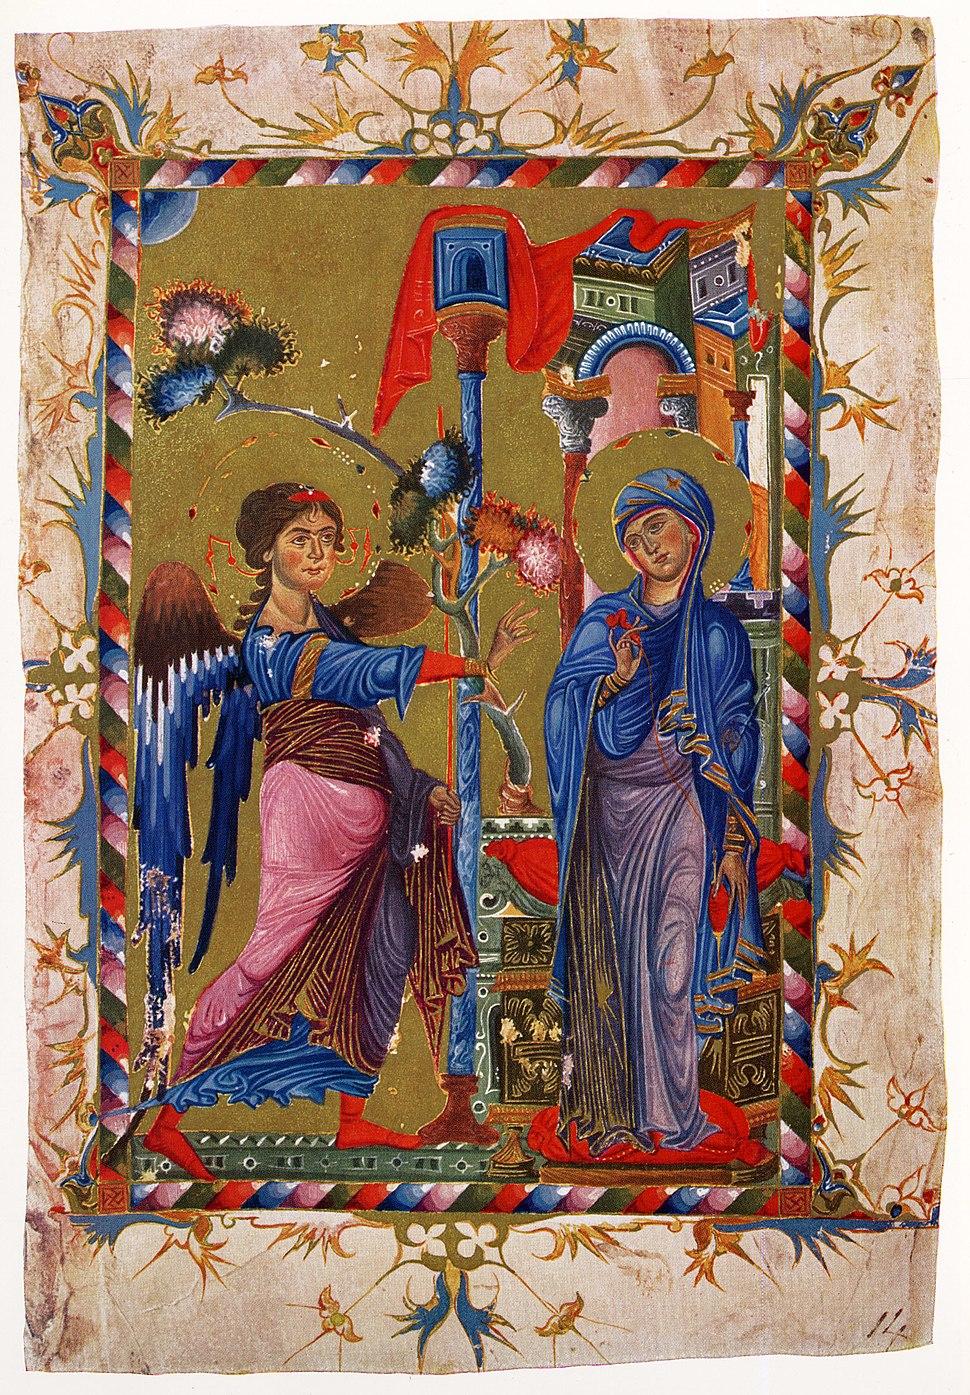 Annunciation from 13th century Armenian Gospel